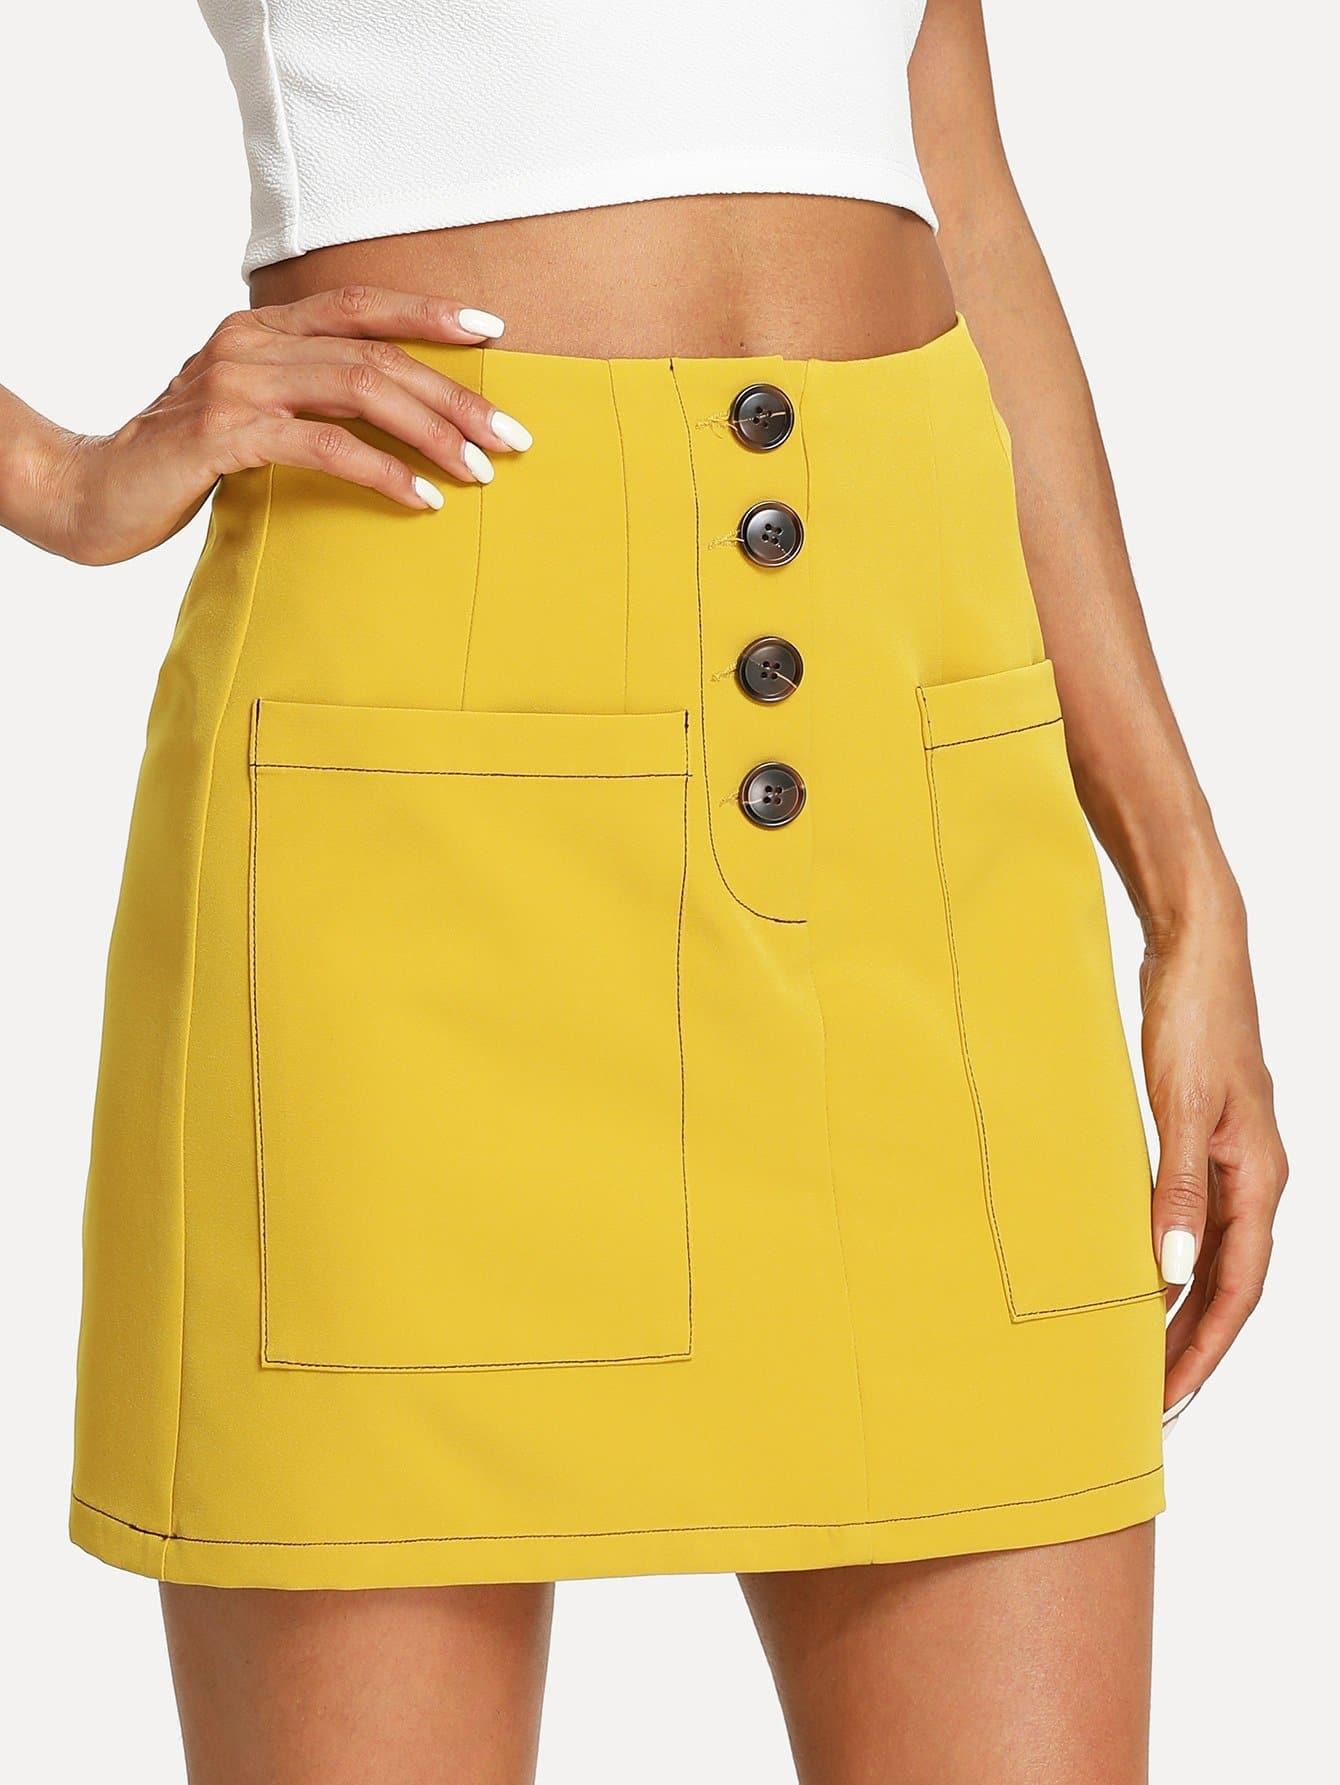 Pocket Patched Button Up Skirt high waist pocket patched dot skirt